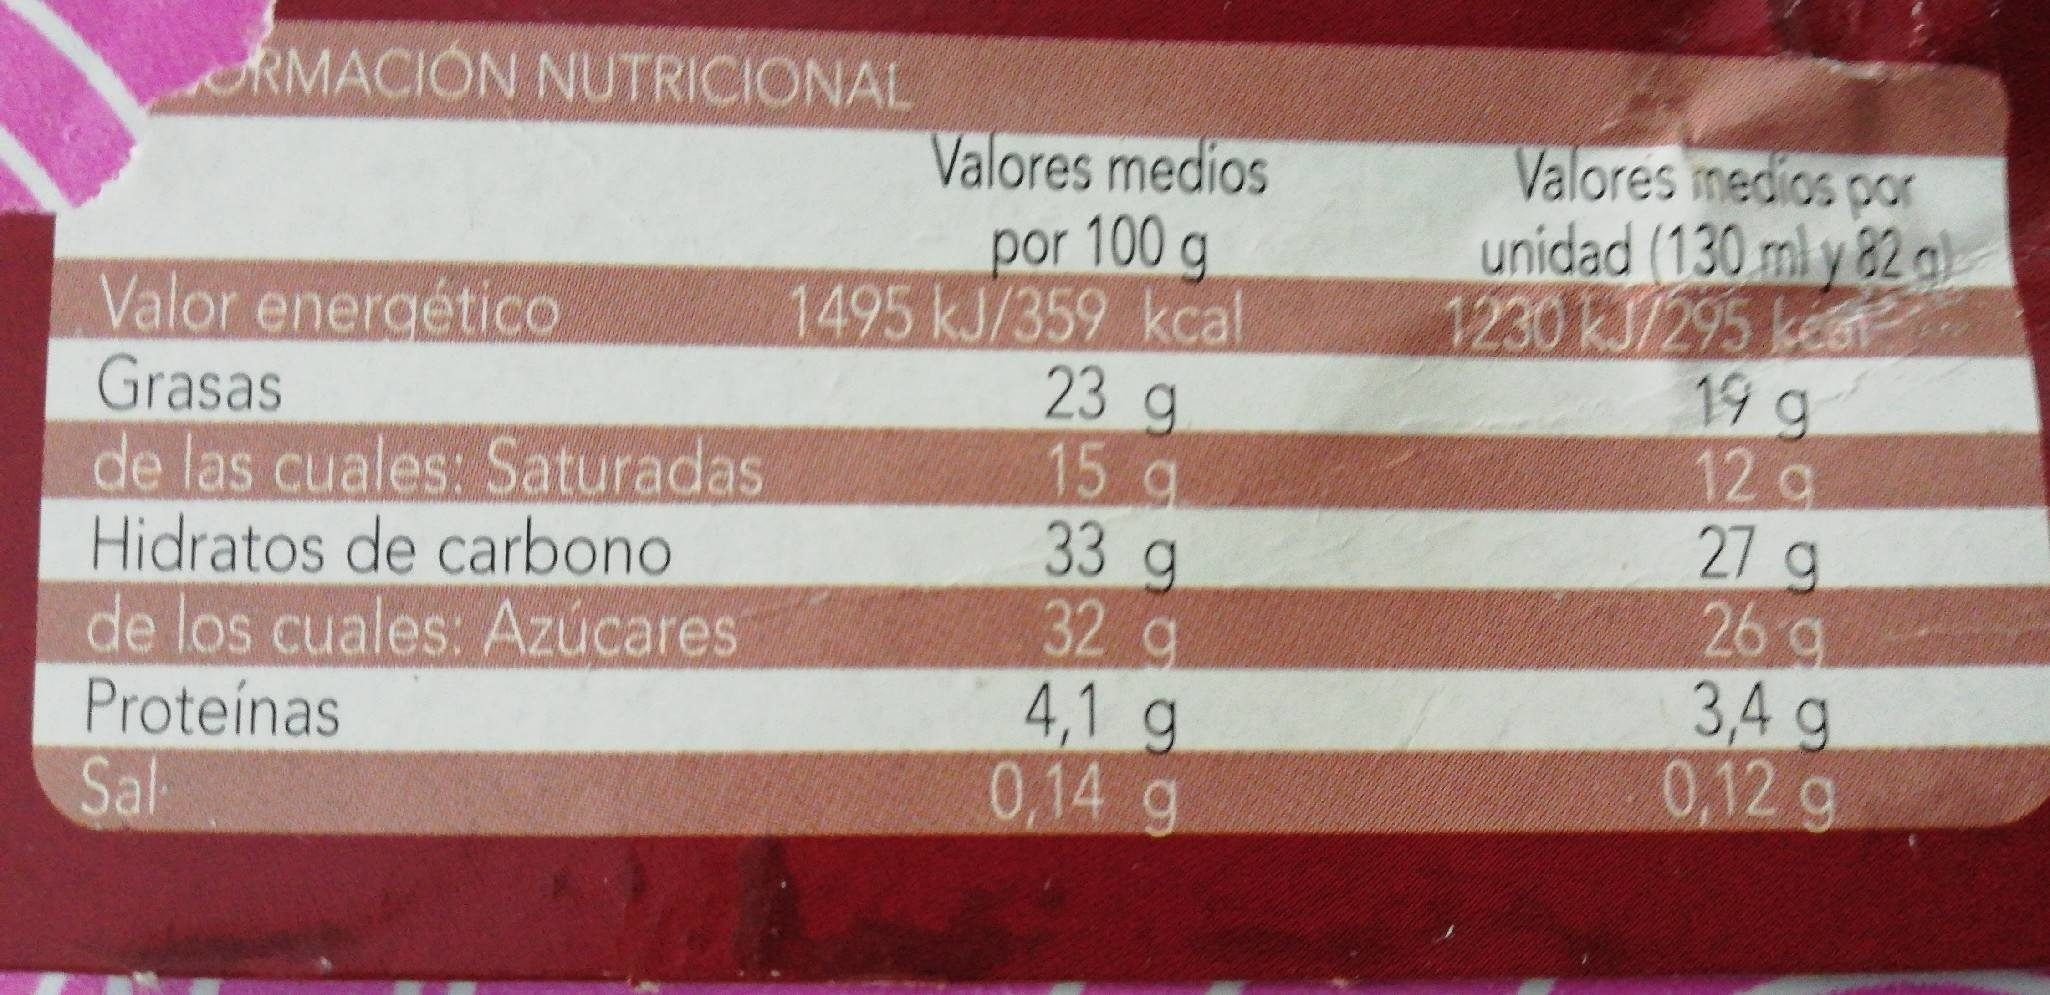 Cône chocolat - Informació nutricional